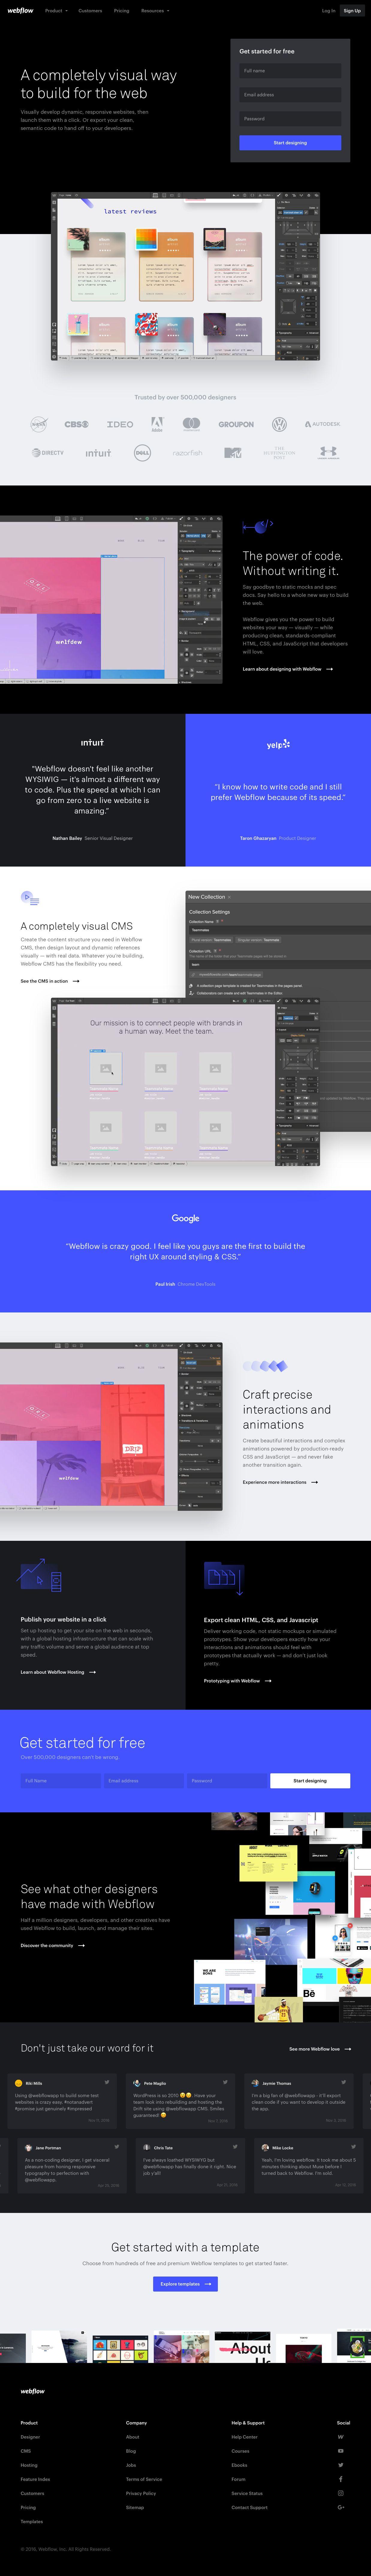 Webflow landing page design inspiration | Lapa Ninja - The